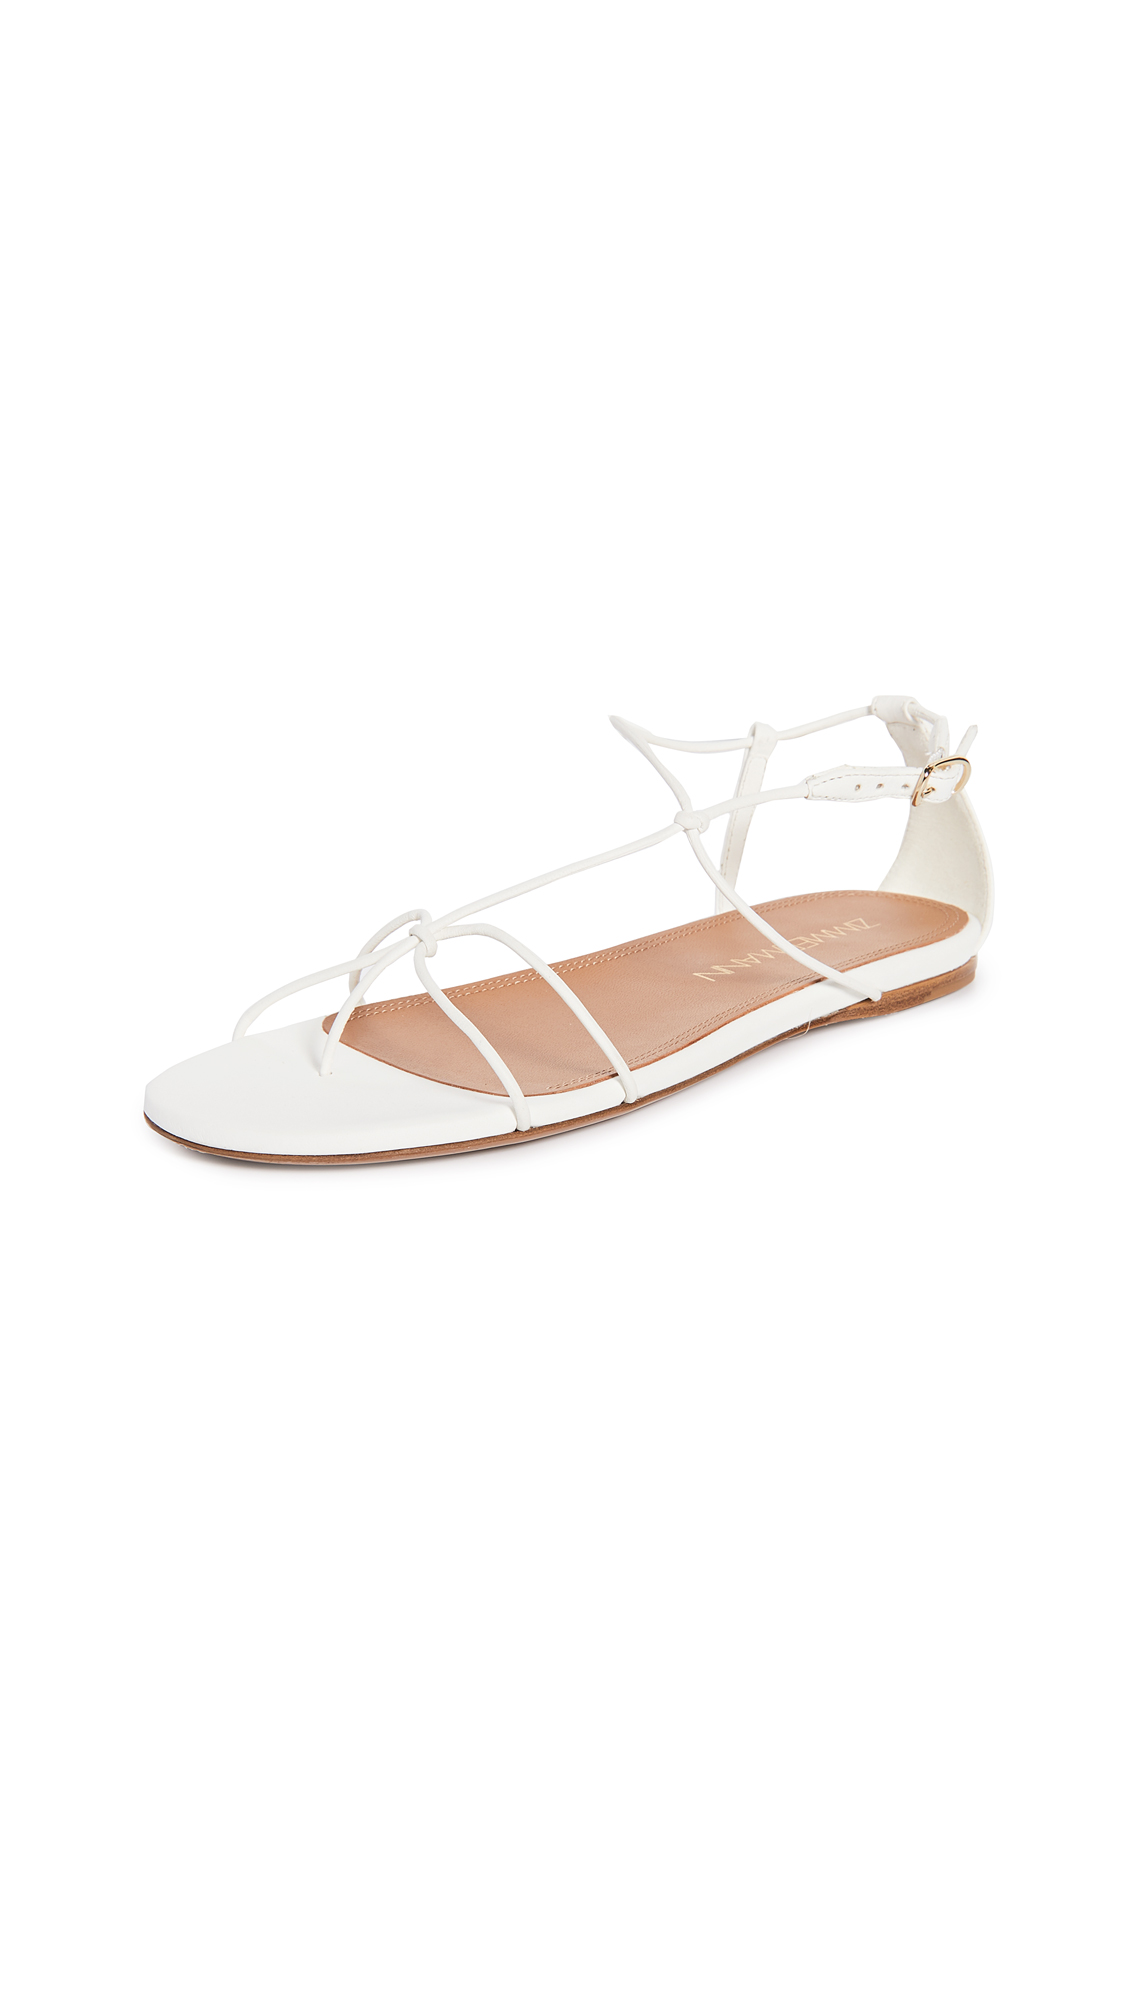 Buy Zimmermann online - photo of Zimmermann Strappy Flat Sandals